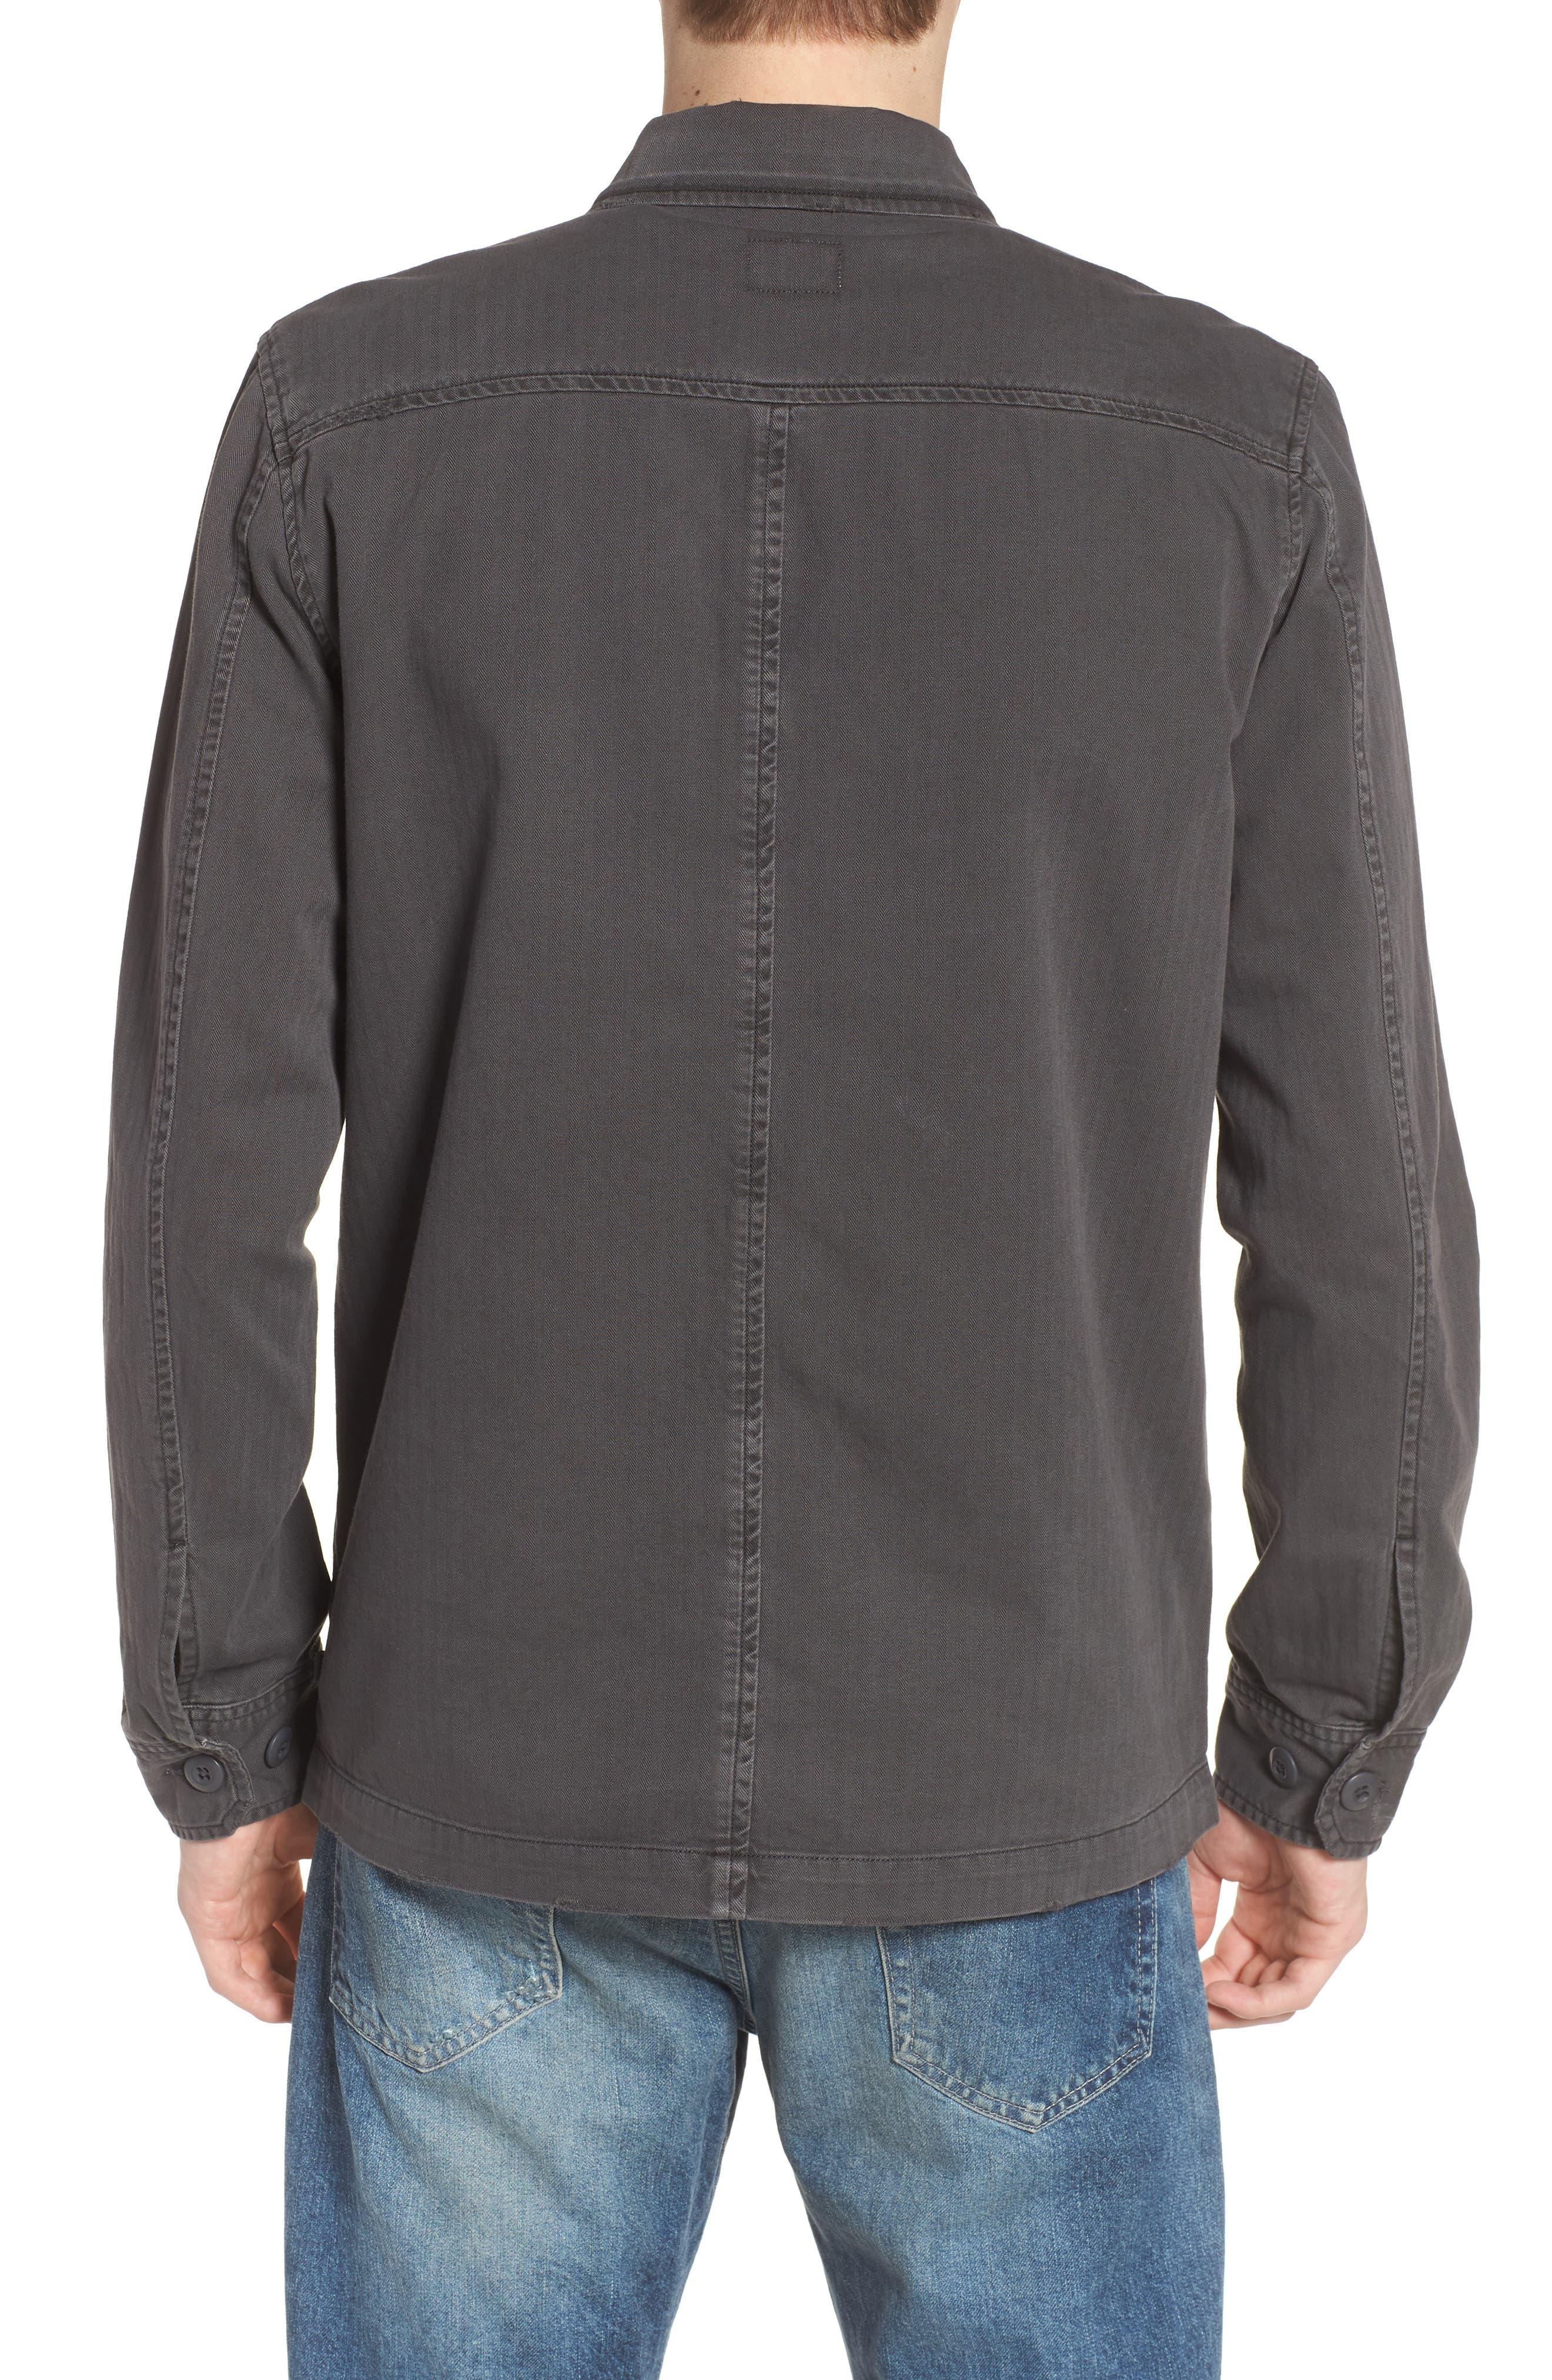 Marx Slim Fit Jacket,                             Alternate thumbnail 2, color,                             5 Years Pigment Smoke Grey